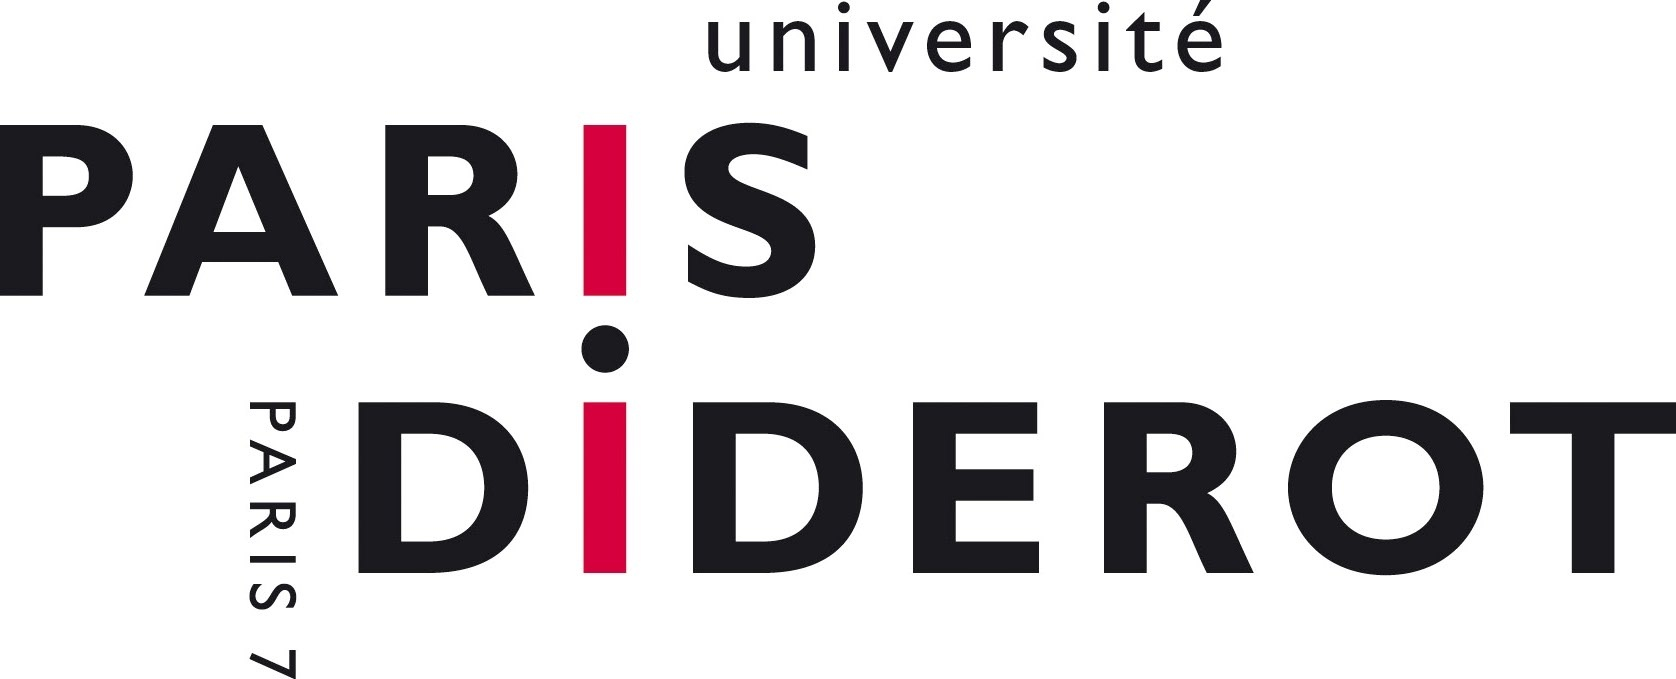 Paris VII University